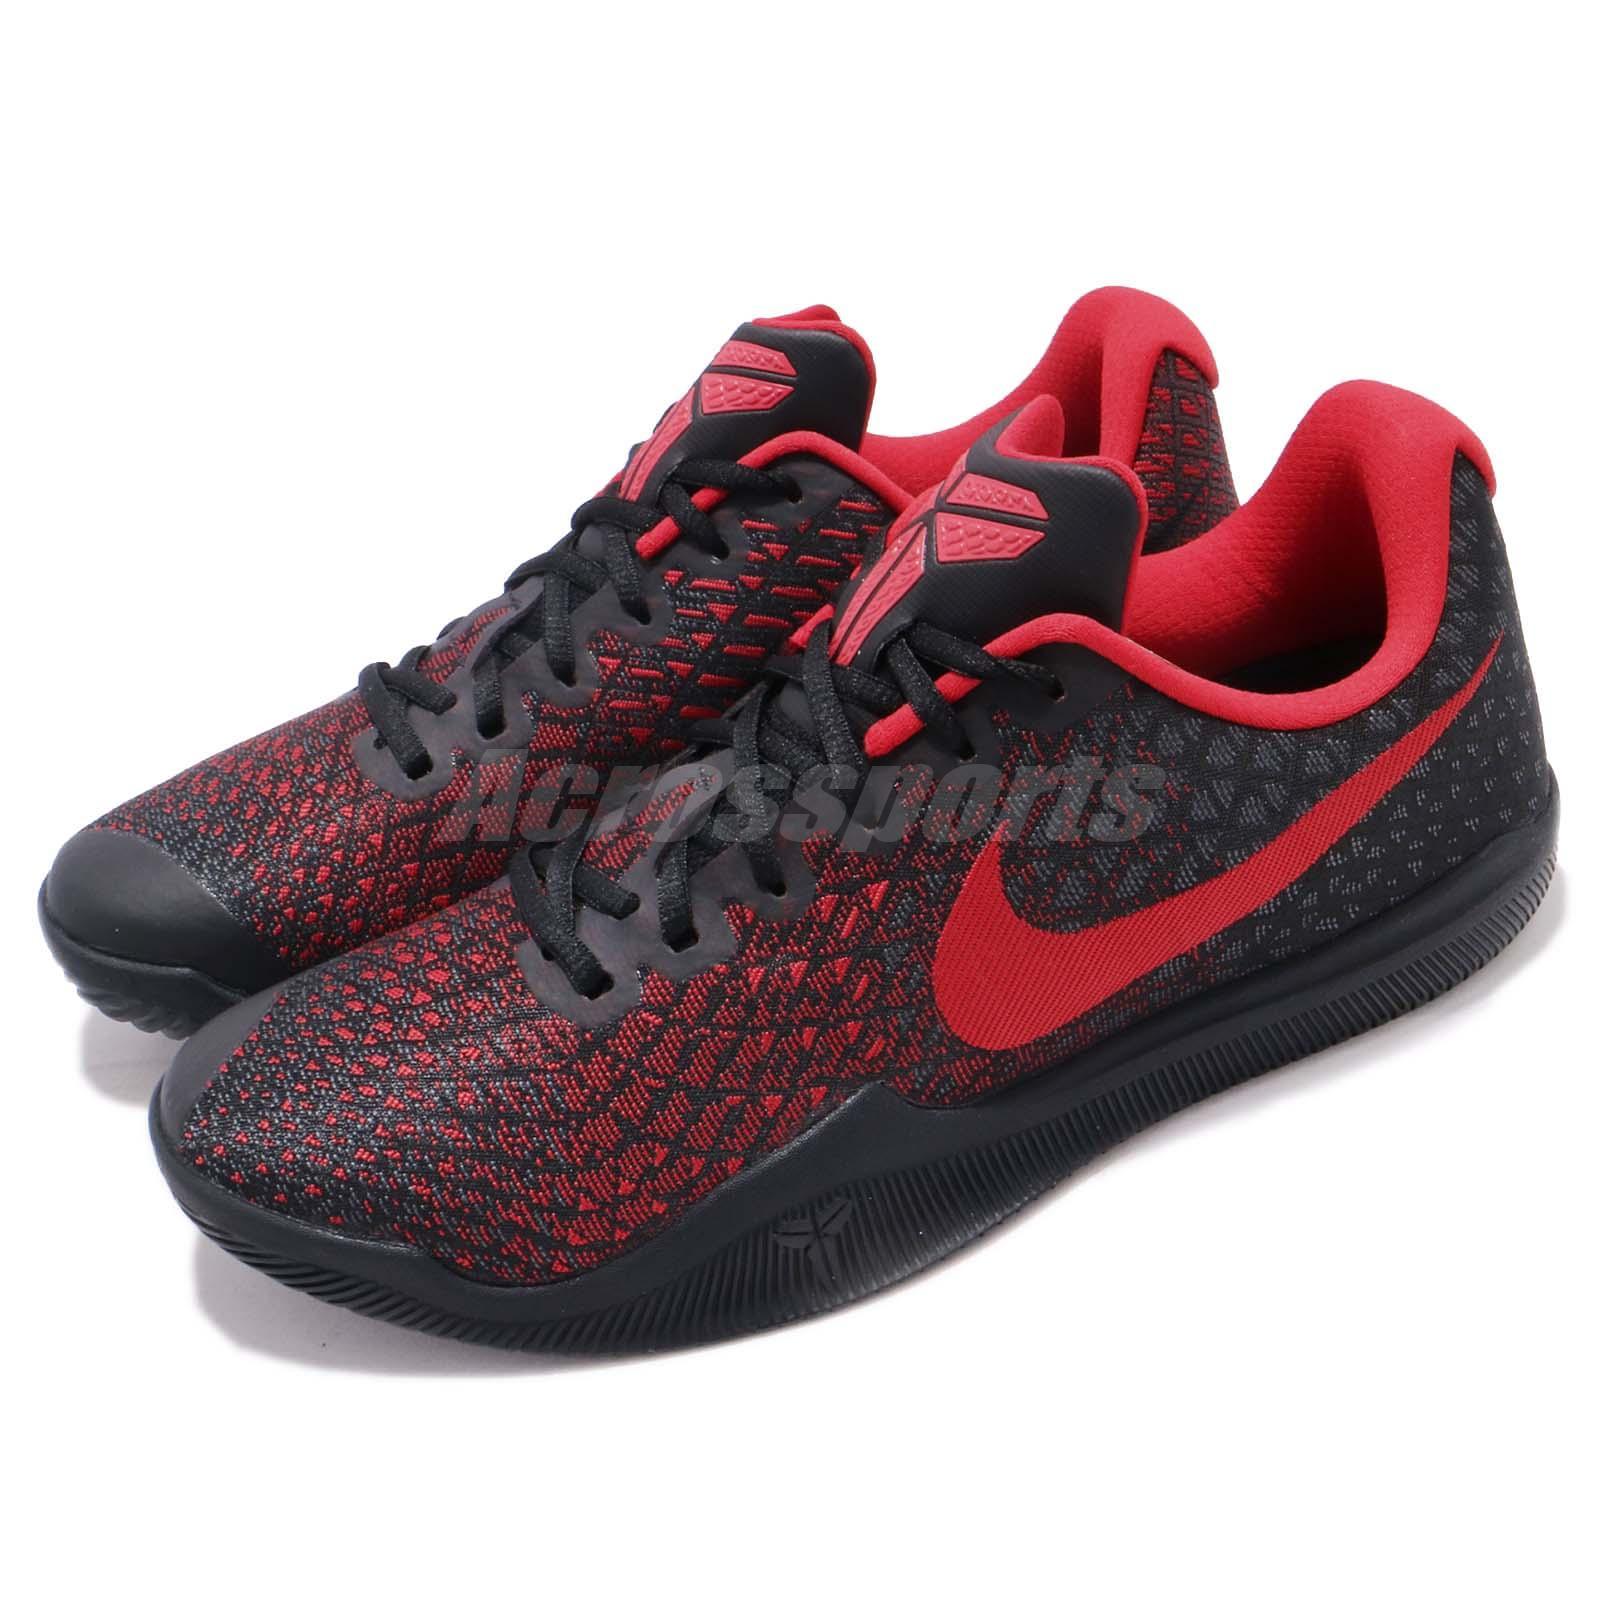 reputable site 6ff61 5b954 Details about Nike Mamba Instinct EP Kobe Bryant Black Red Men Basketball  Shoes 884445-016